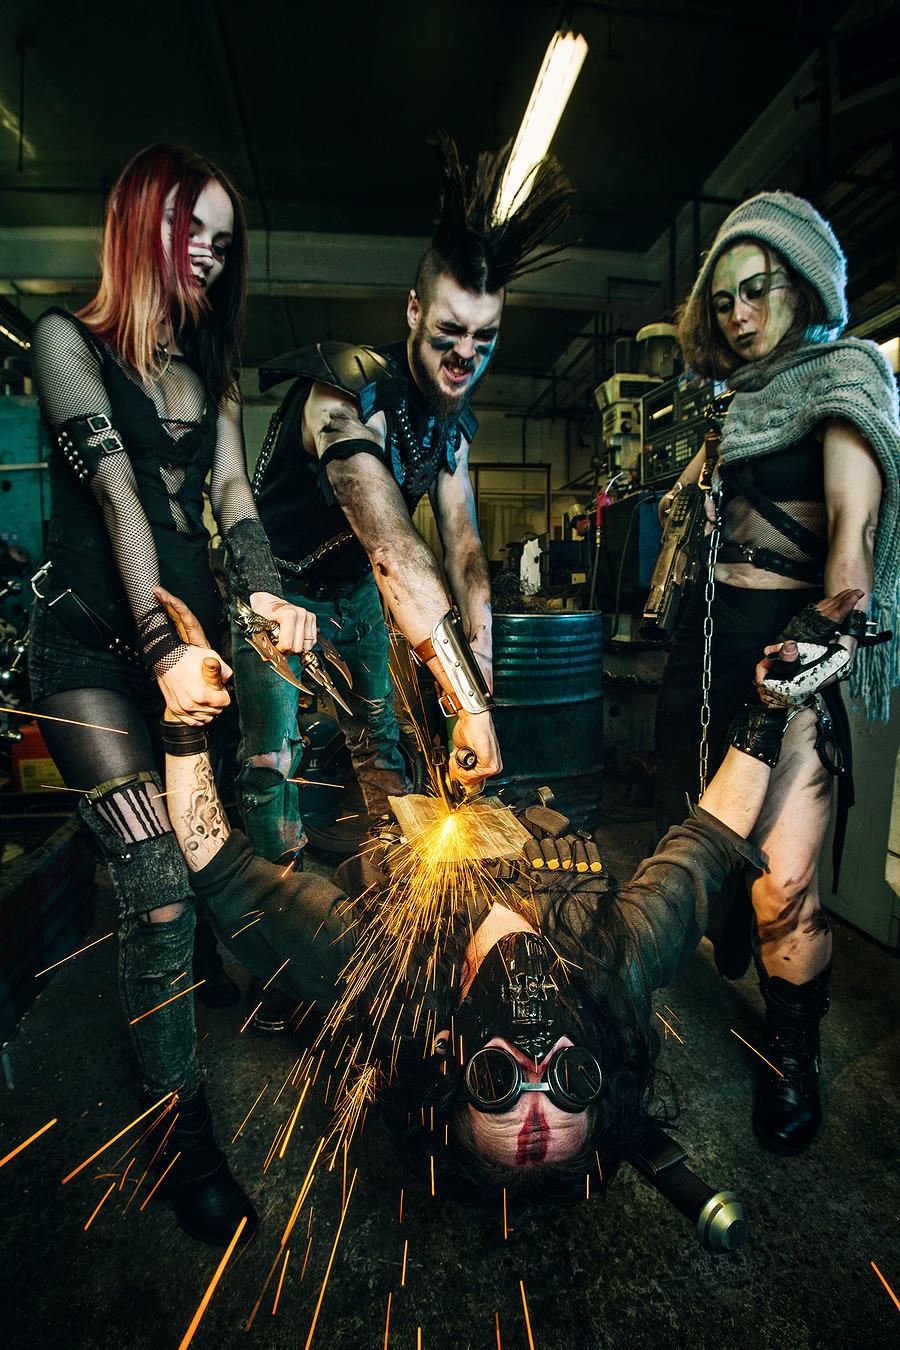 Post Apocalyptic Metal Mayhem / Photography by Richard Wakefield, Model KaosAdy, Post processing by Richard Wakefield, Stylist KaosAdy / Uploaded 19th April 2016 @ 01:33 PM